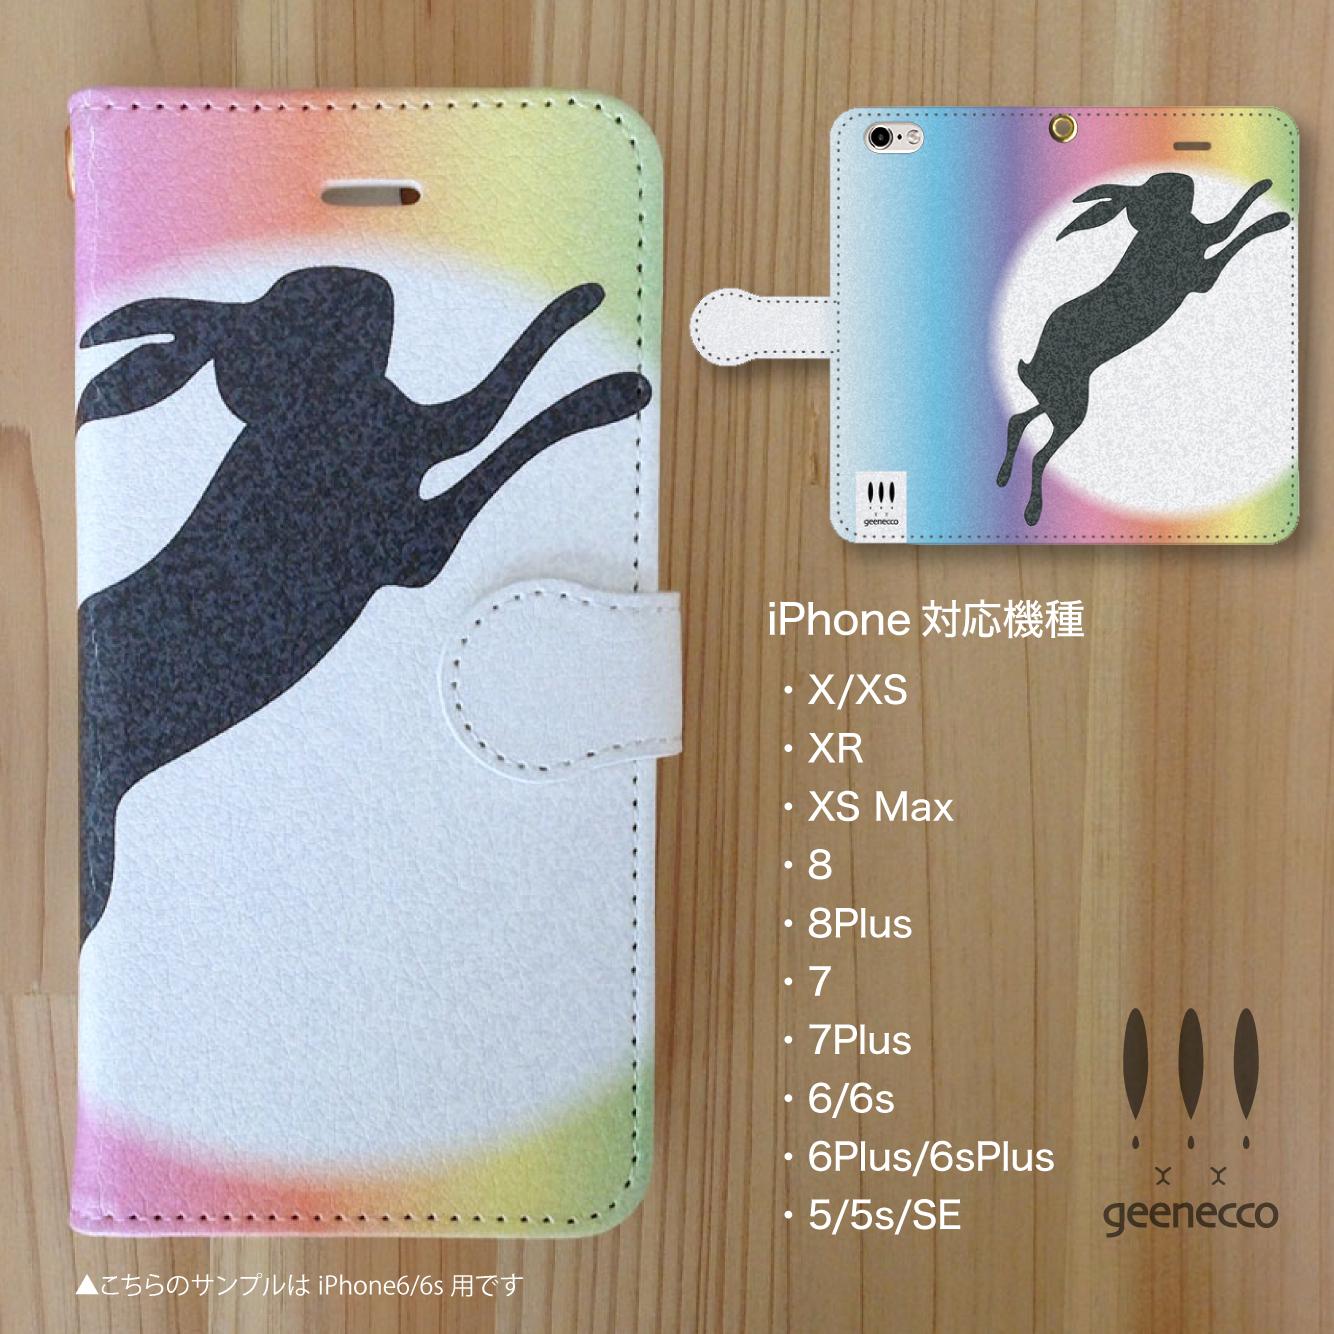 〈iPhone用〉手帳型スマホケース 〜跳ねウサギ 虹色〜 (iPhone X/XS・iPhone XR・iPhone XS Max・iPhone8・iPhone8Plus・iPhone7・iPhone7Plus・iPhone6/6s・iPhone6Plus/6sPlus・iPhone5/5s/SE 対応)